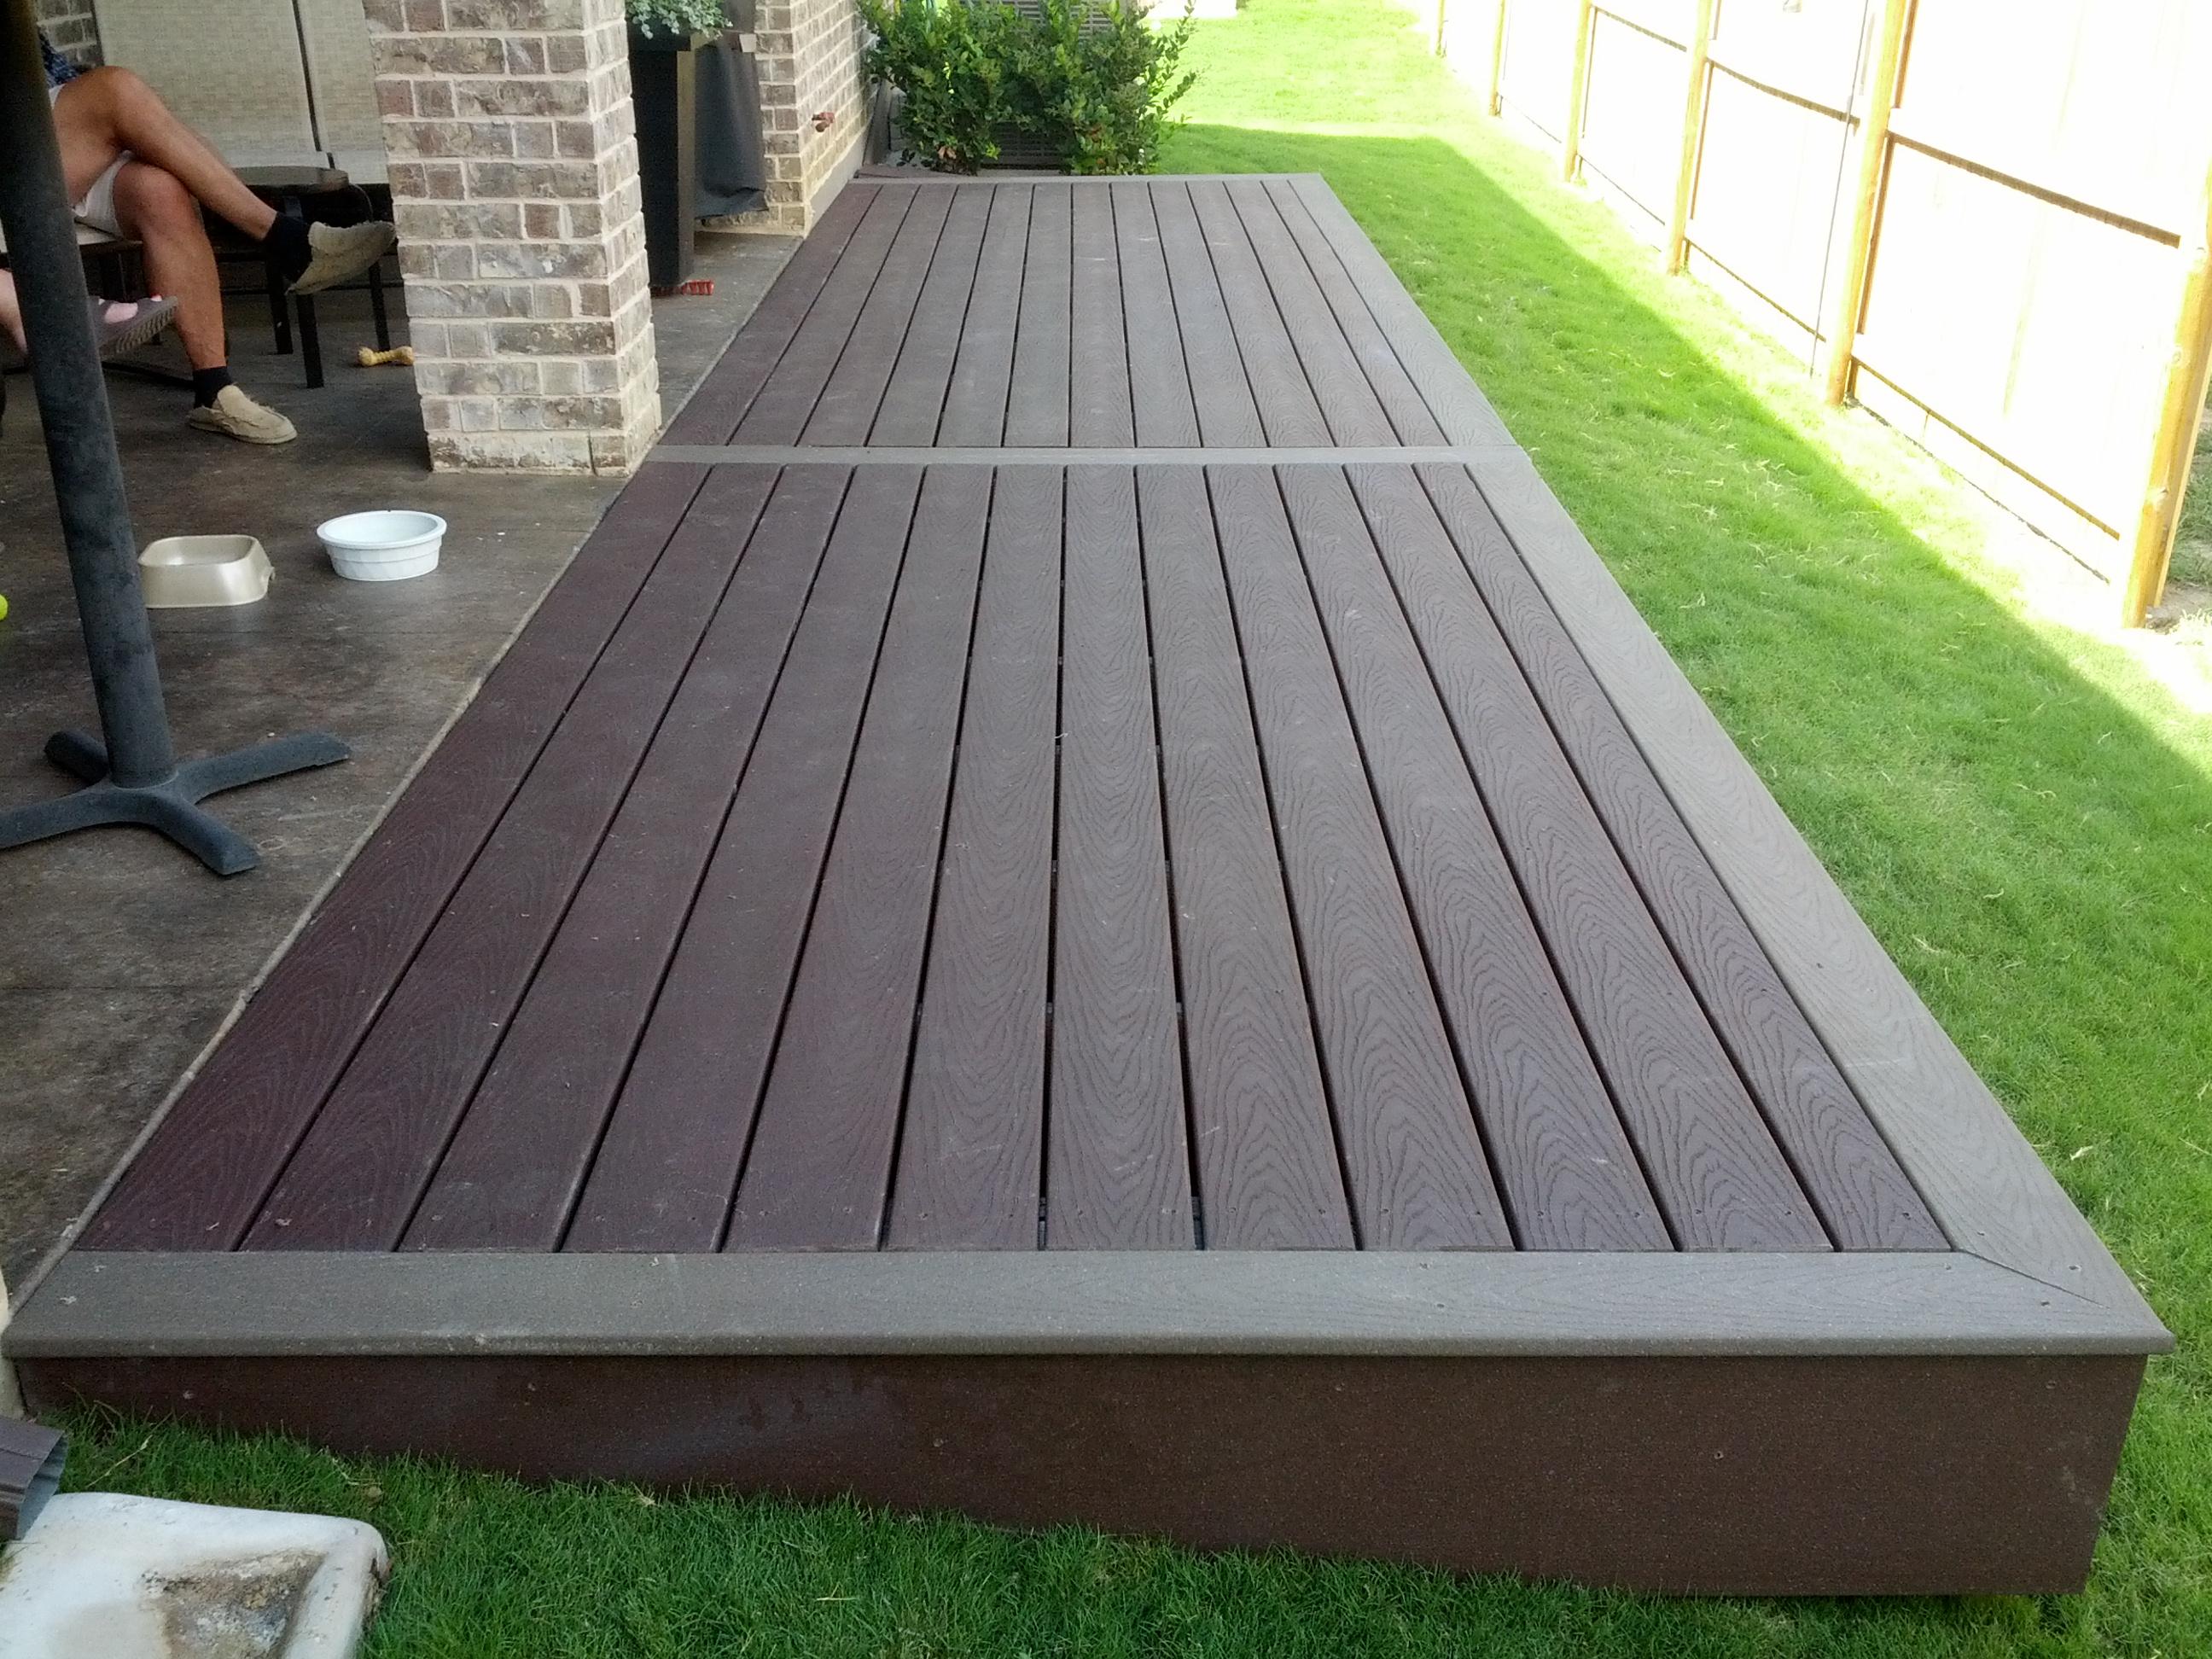 Composite deck ideas Design Ideas Composite Decking Designs With Best Ideas About Trex Colors 2017 In Size 2592 1944 The Runners Soul Best Composite Decking 2017 Decks Ideas